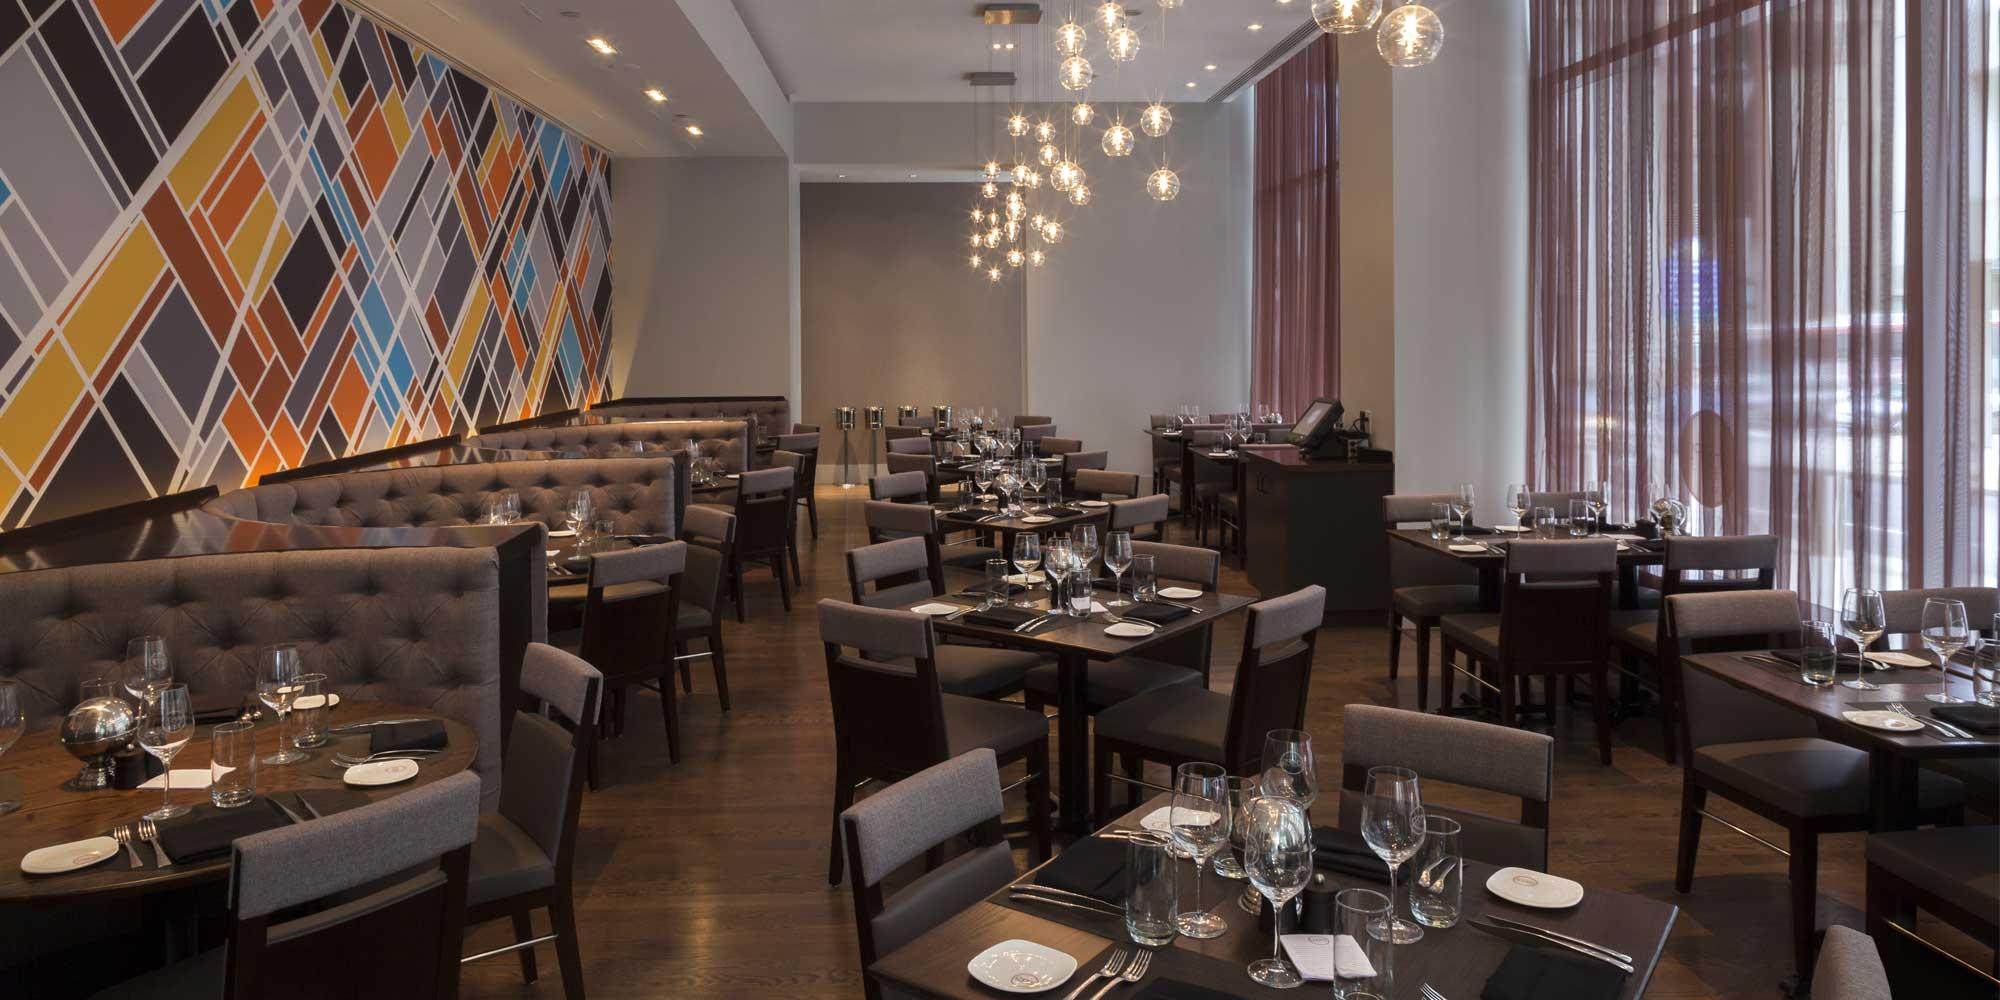 Chops Restaraunt Philadelphia Steakhouse